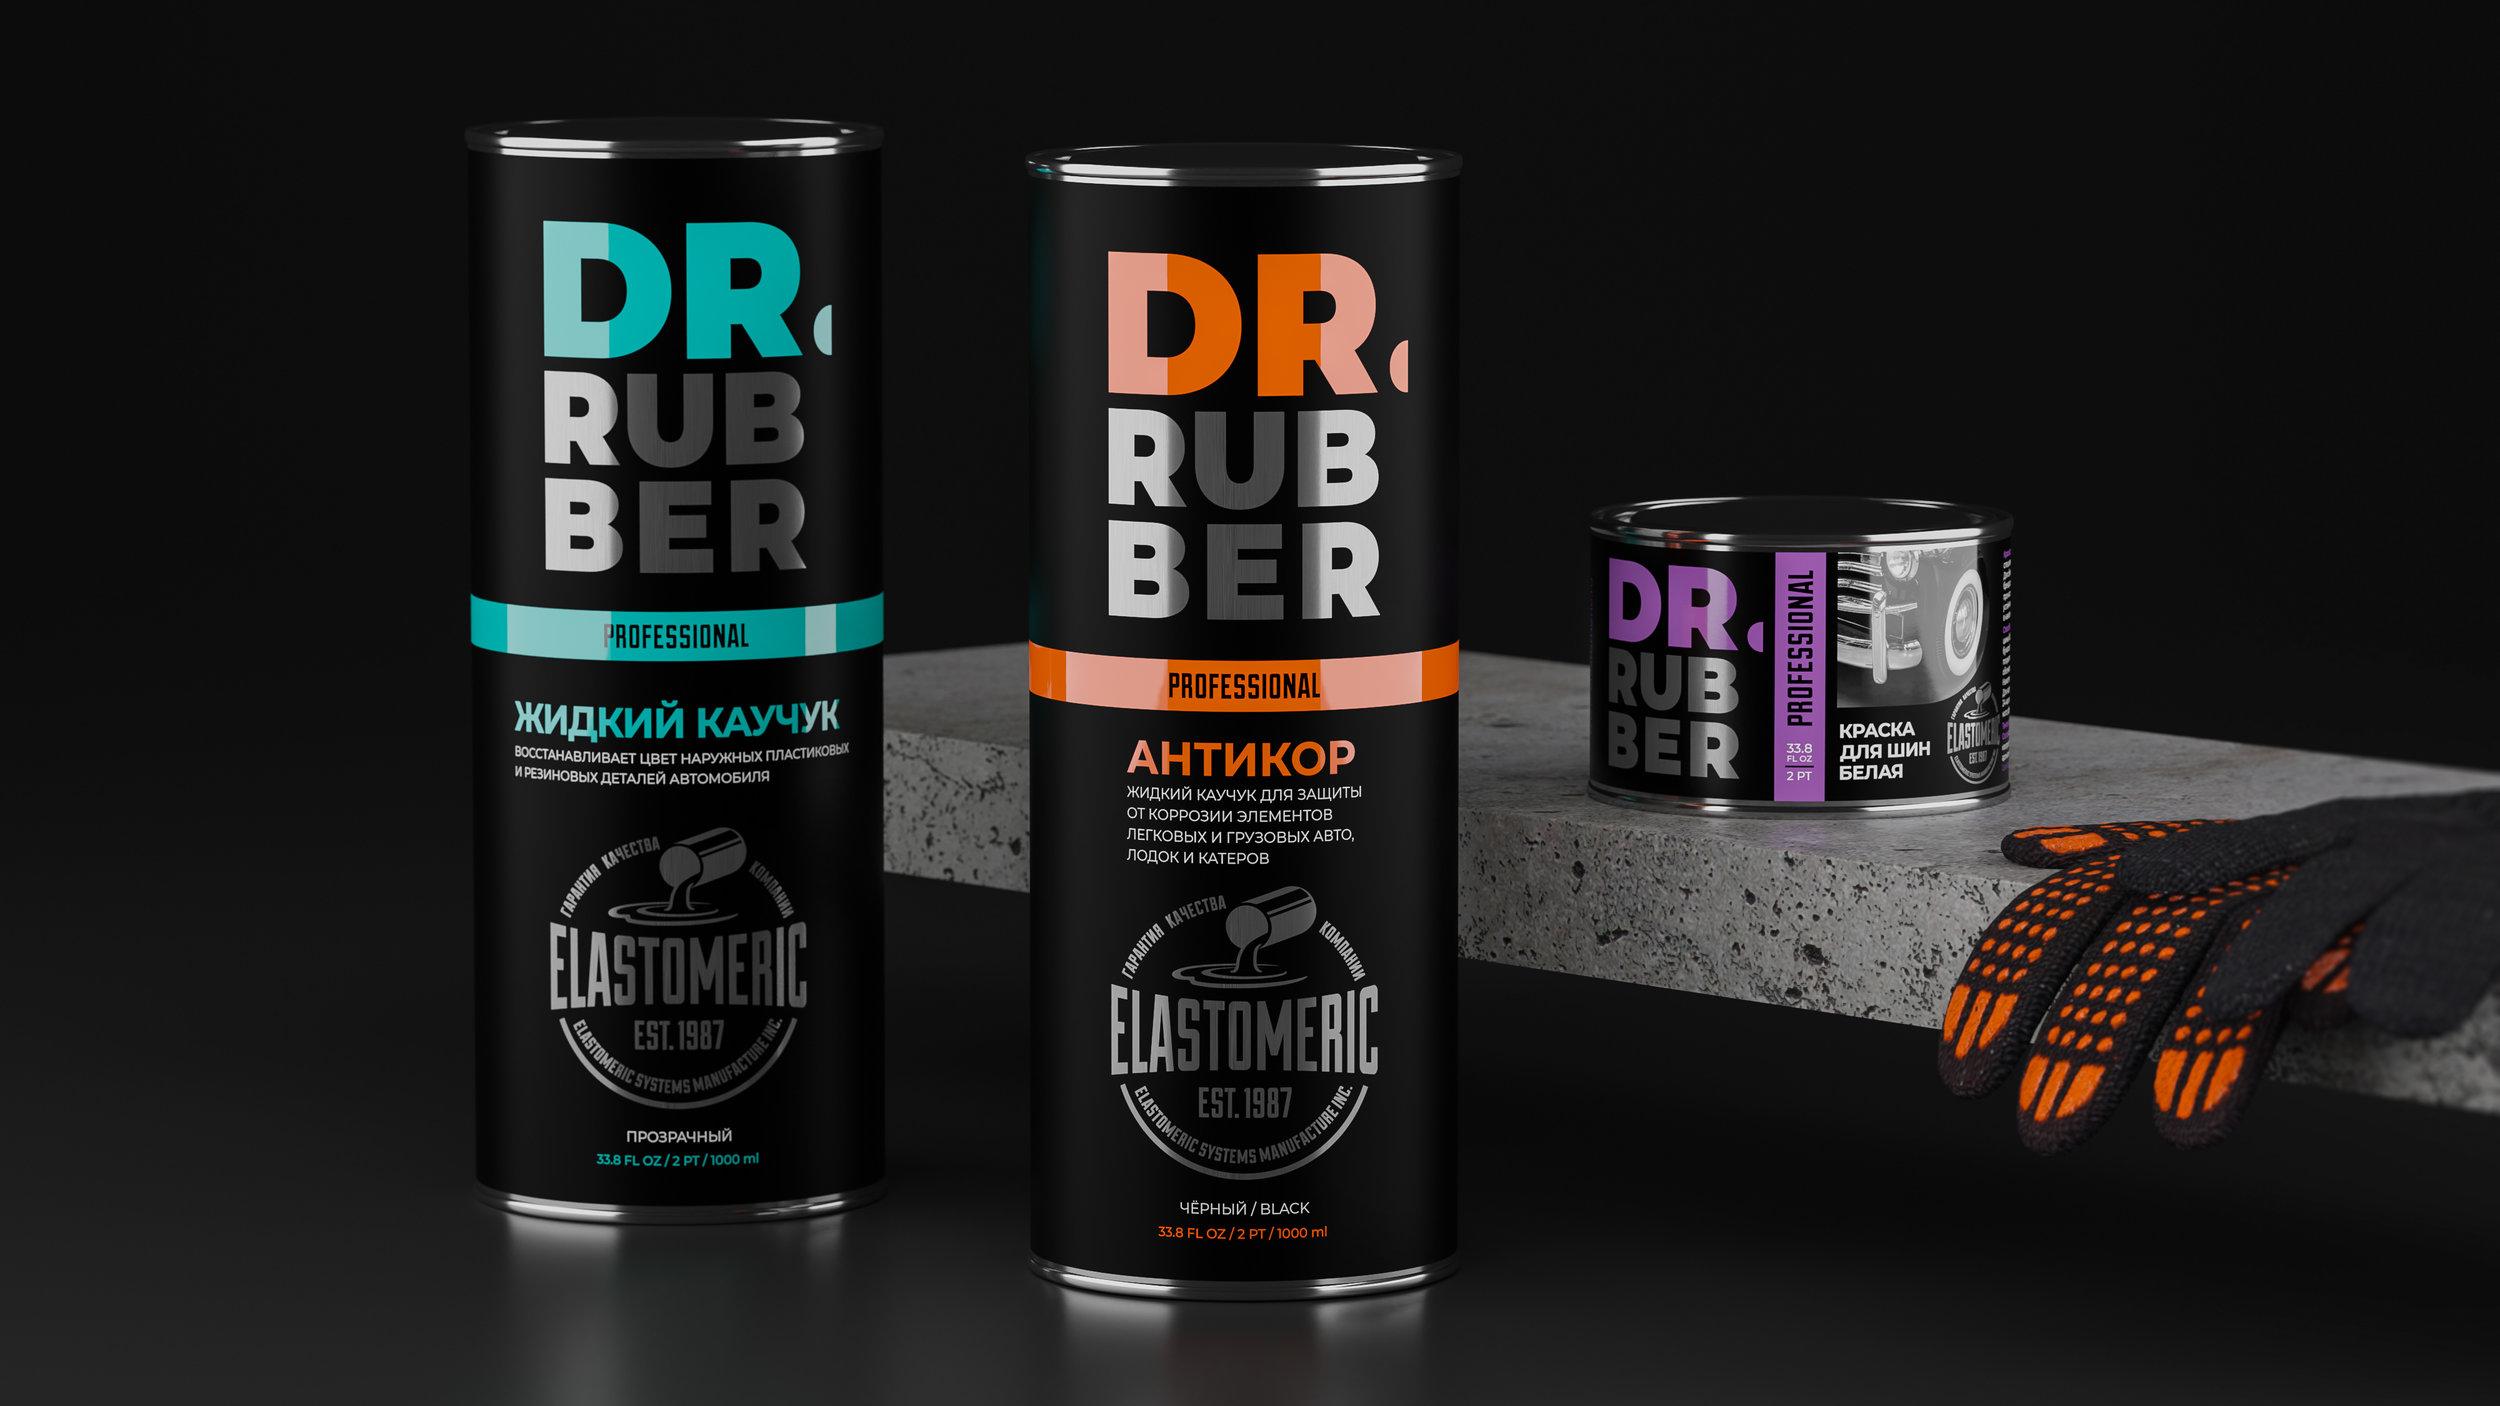 Branding of Dr. Rubber By CUBA Creative Branding Studio For Elastomeric Systems